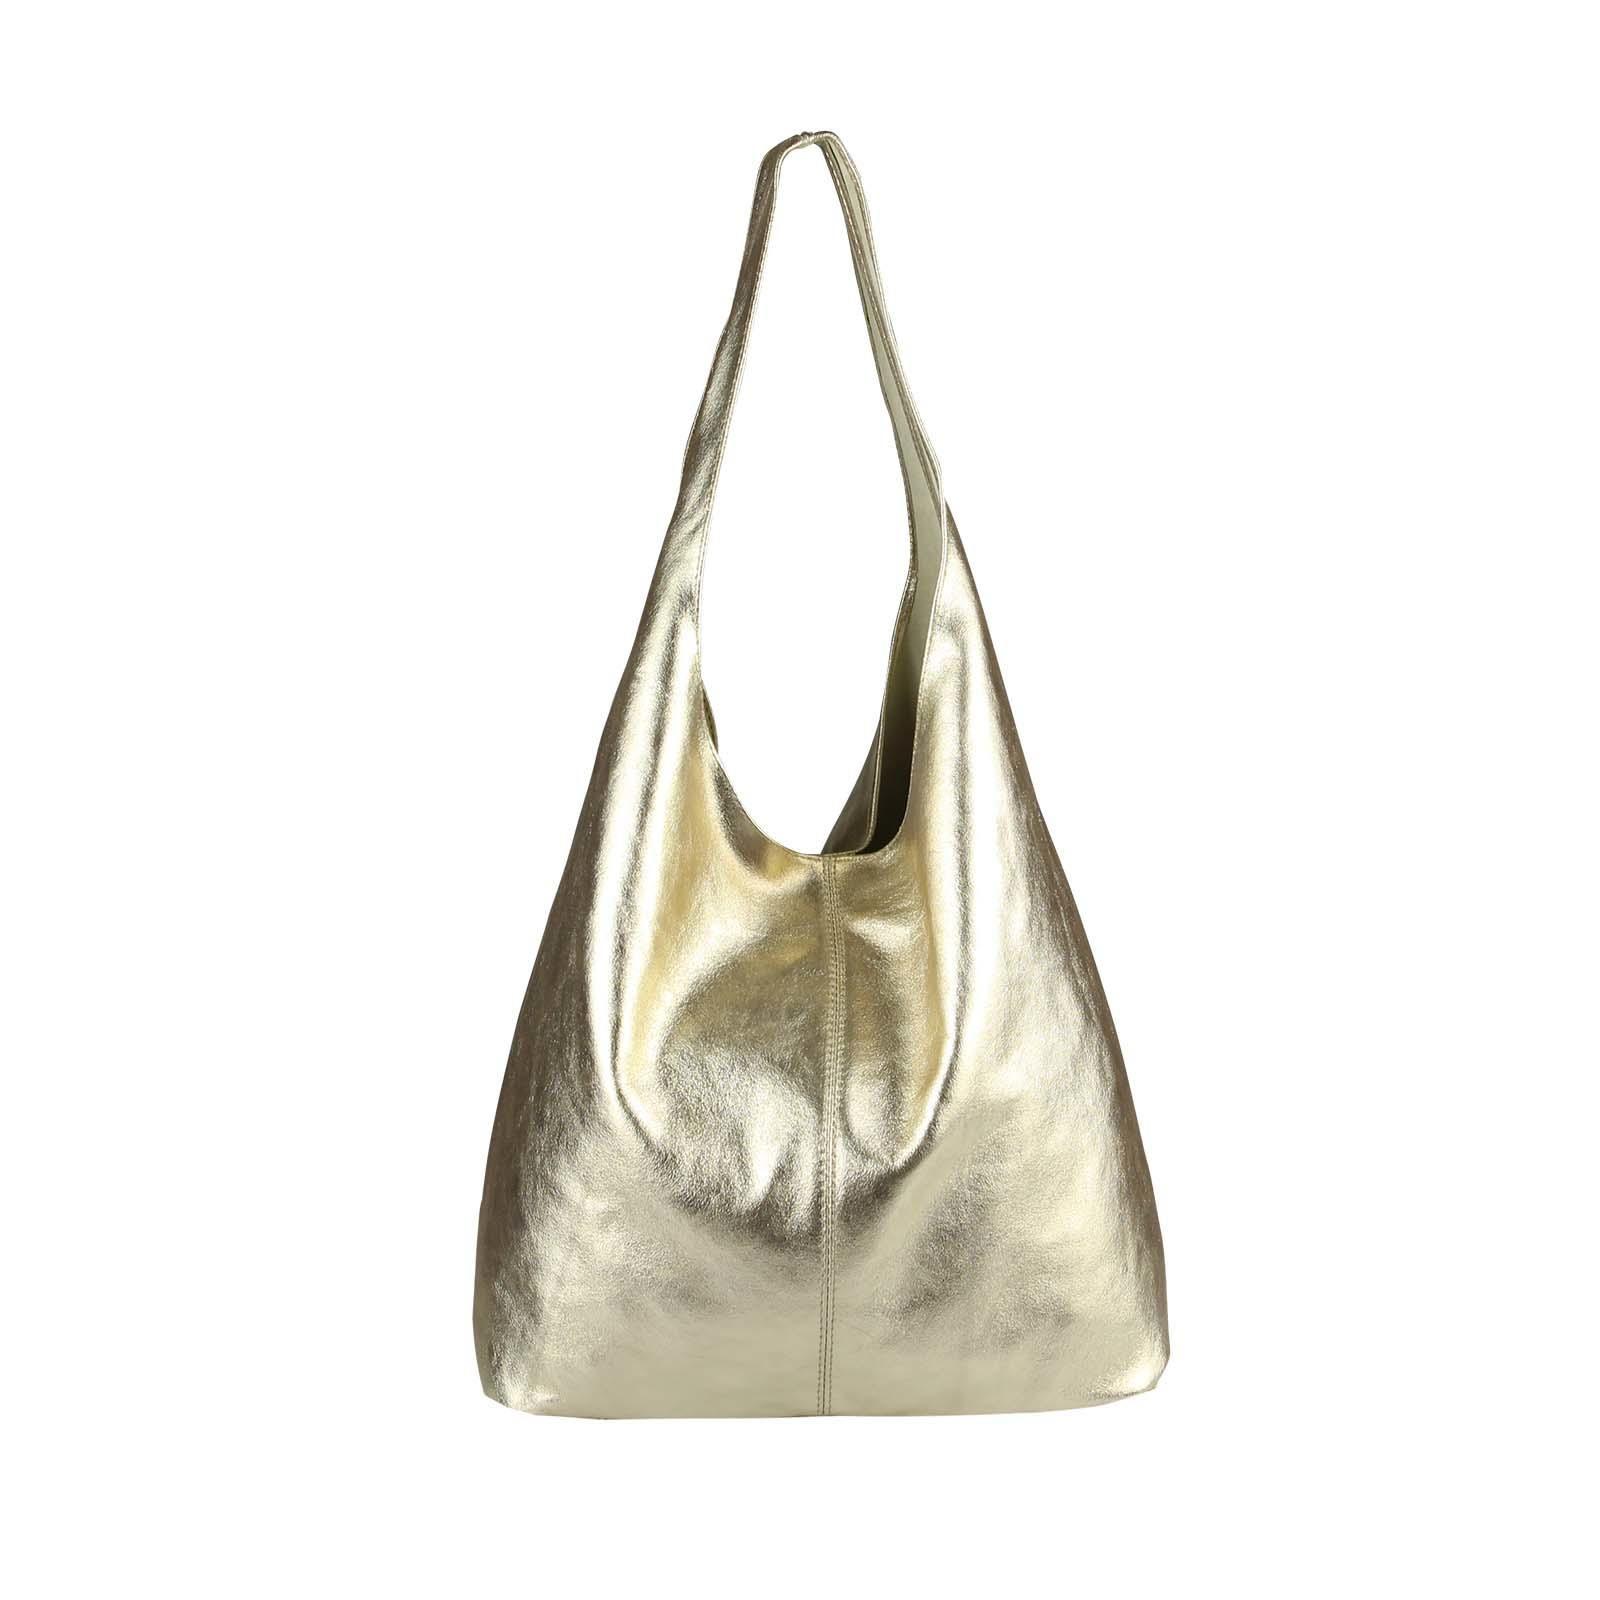 ba645c2dad74a OBC MADE IN ITALY DAMEN LEDER HAND-TASCHE METALLIC Shopper Schultertasche  Hobo-Bag Henkeltasche Beuteltasche Gold